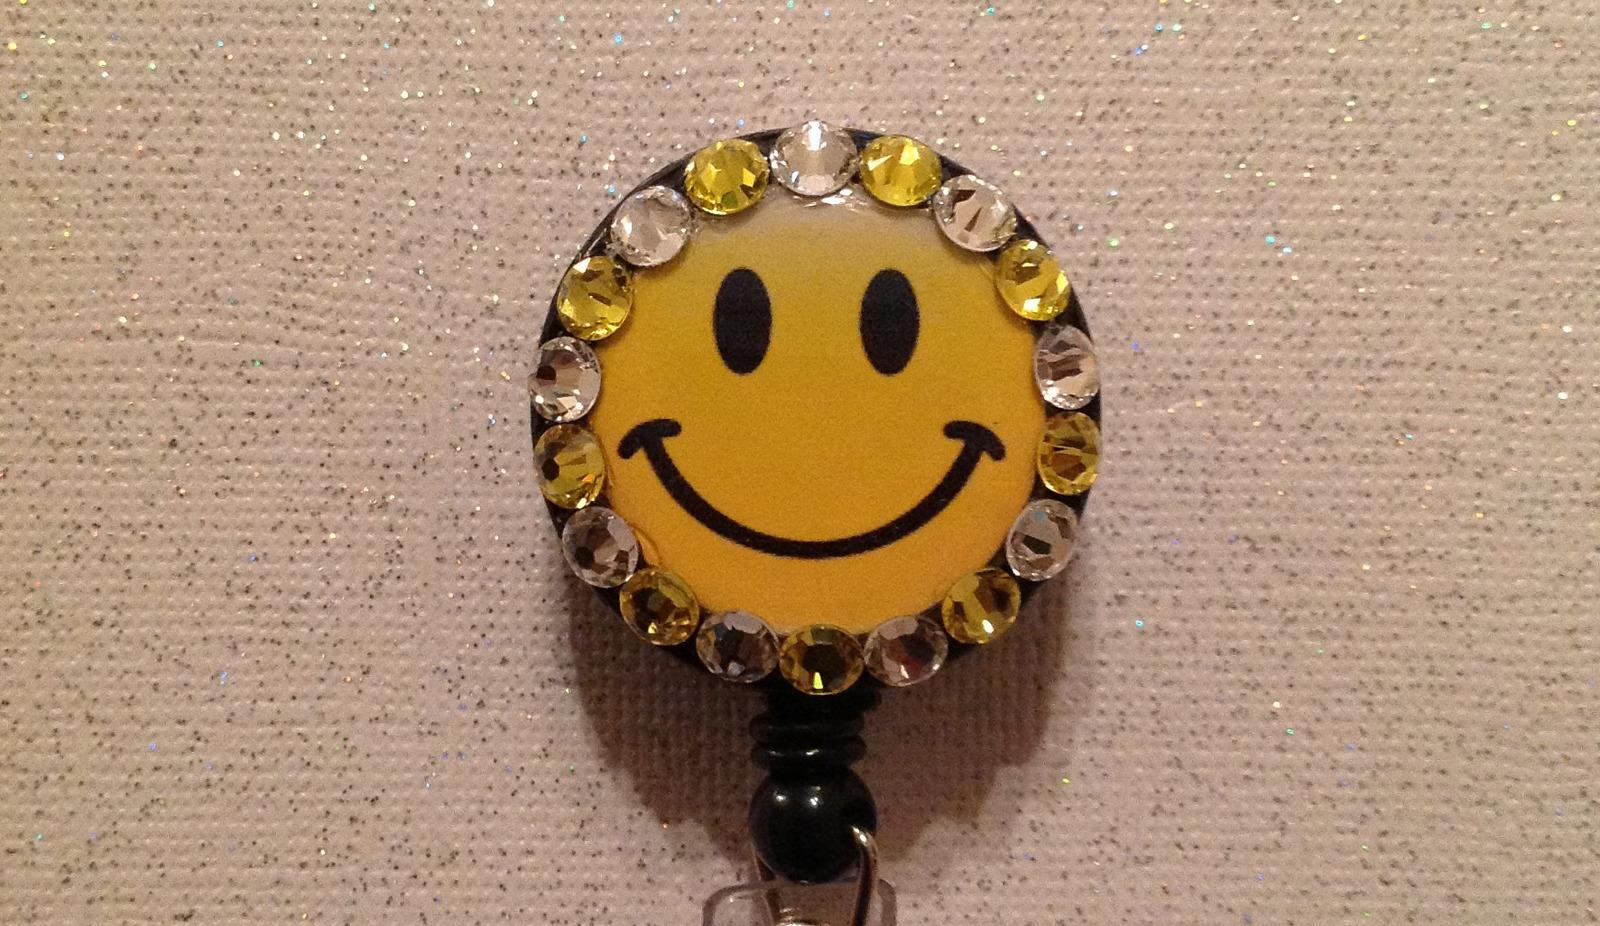 Happy Face Badge Reel Id Holder Swarovski Crystals Alligator Clip Yellow